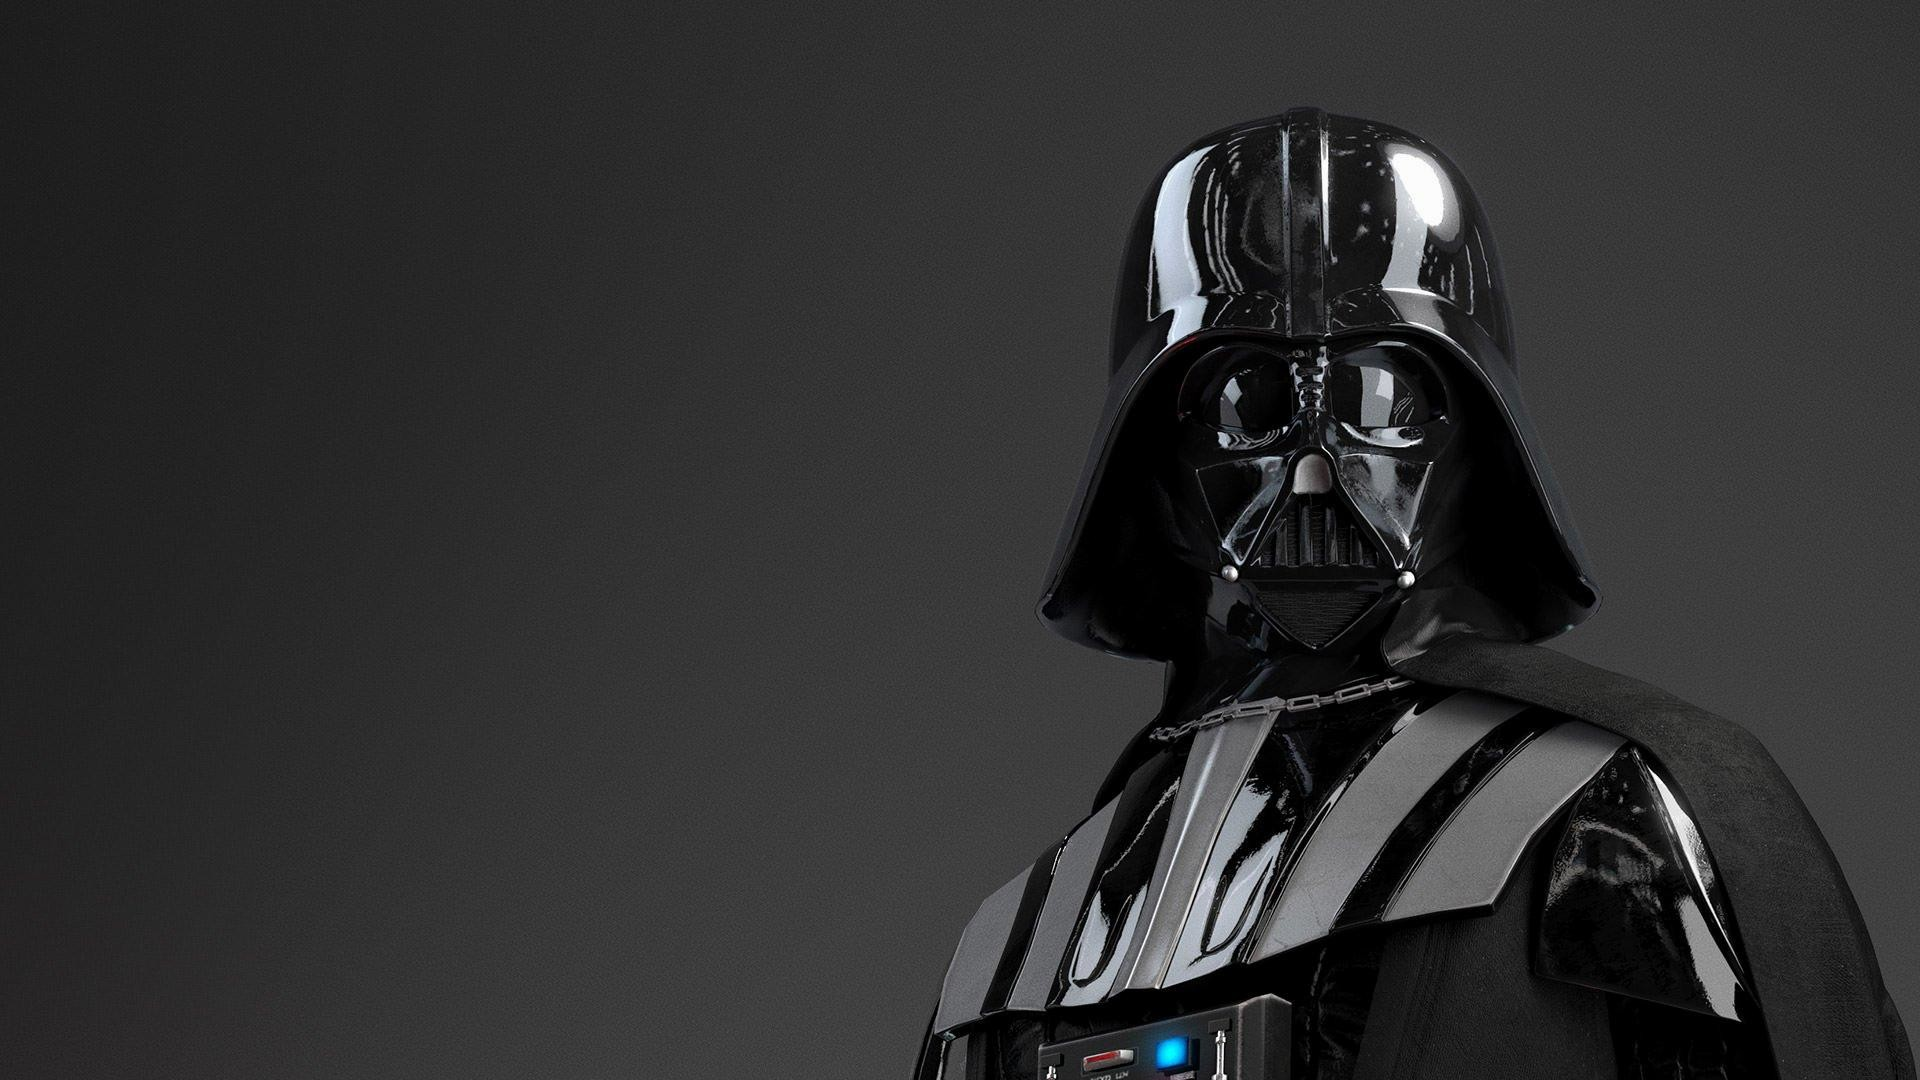 Darth Vader Wallpaper 75 Images